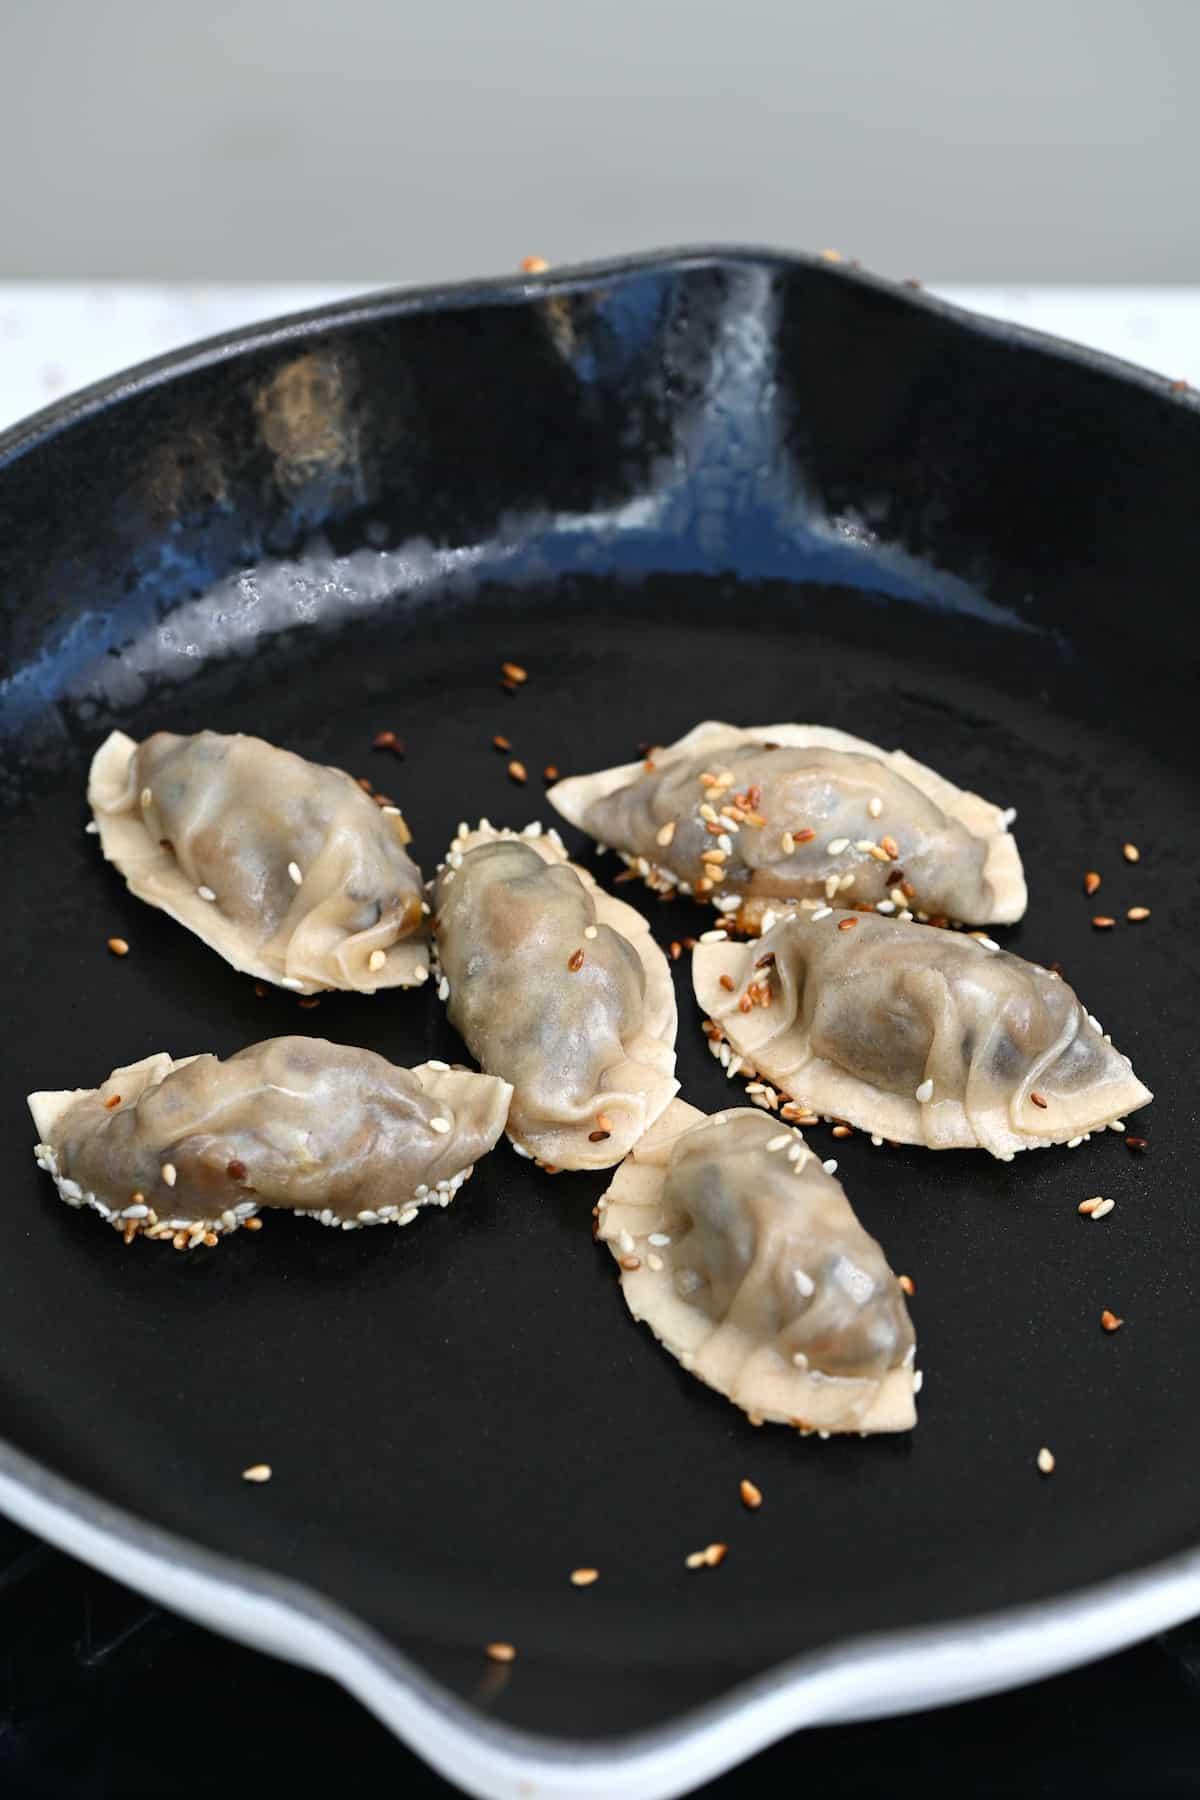 Searing dumplings on a pan